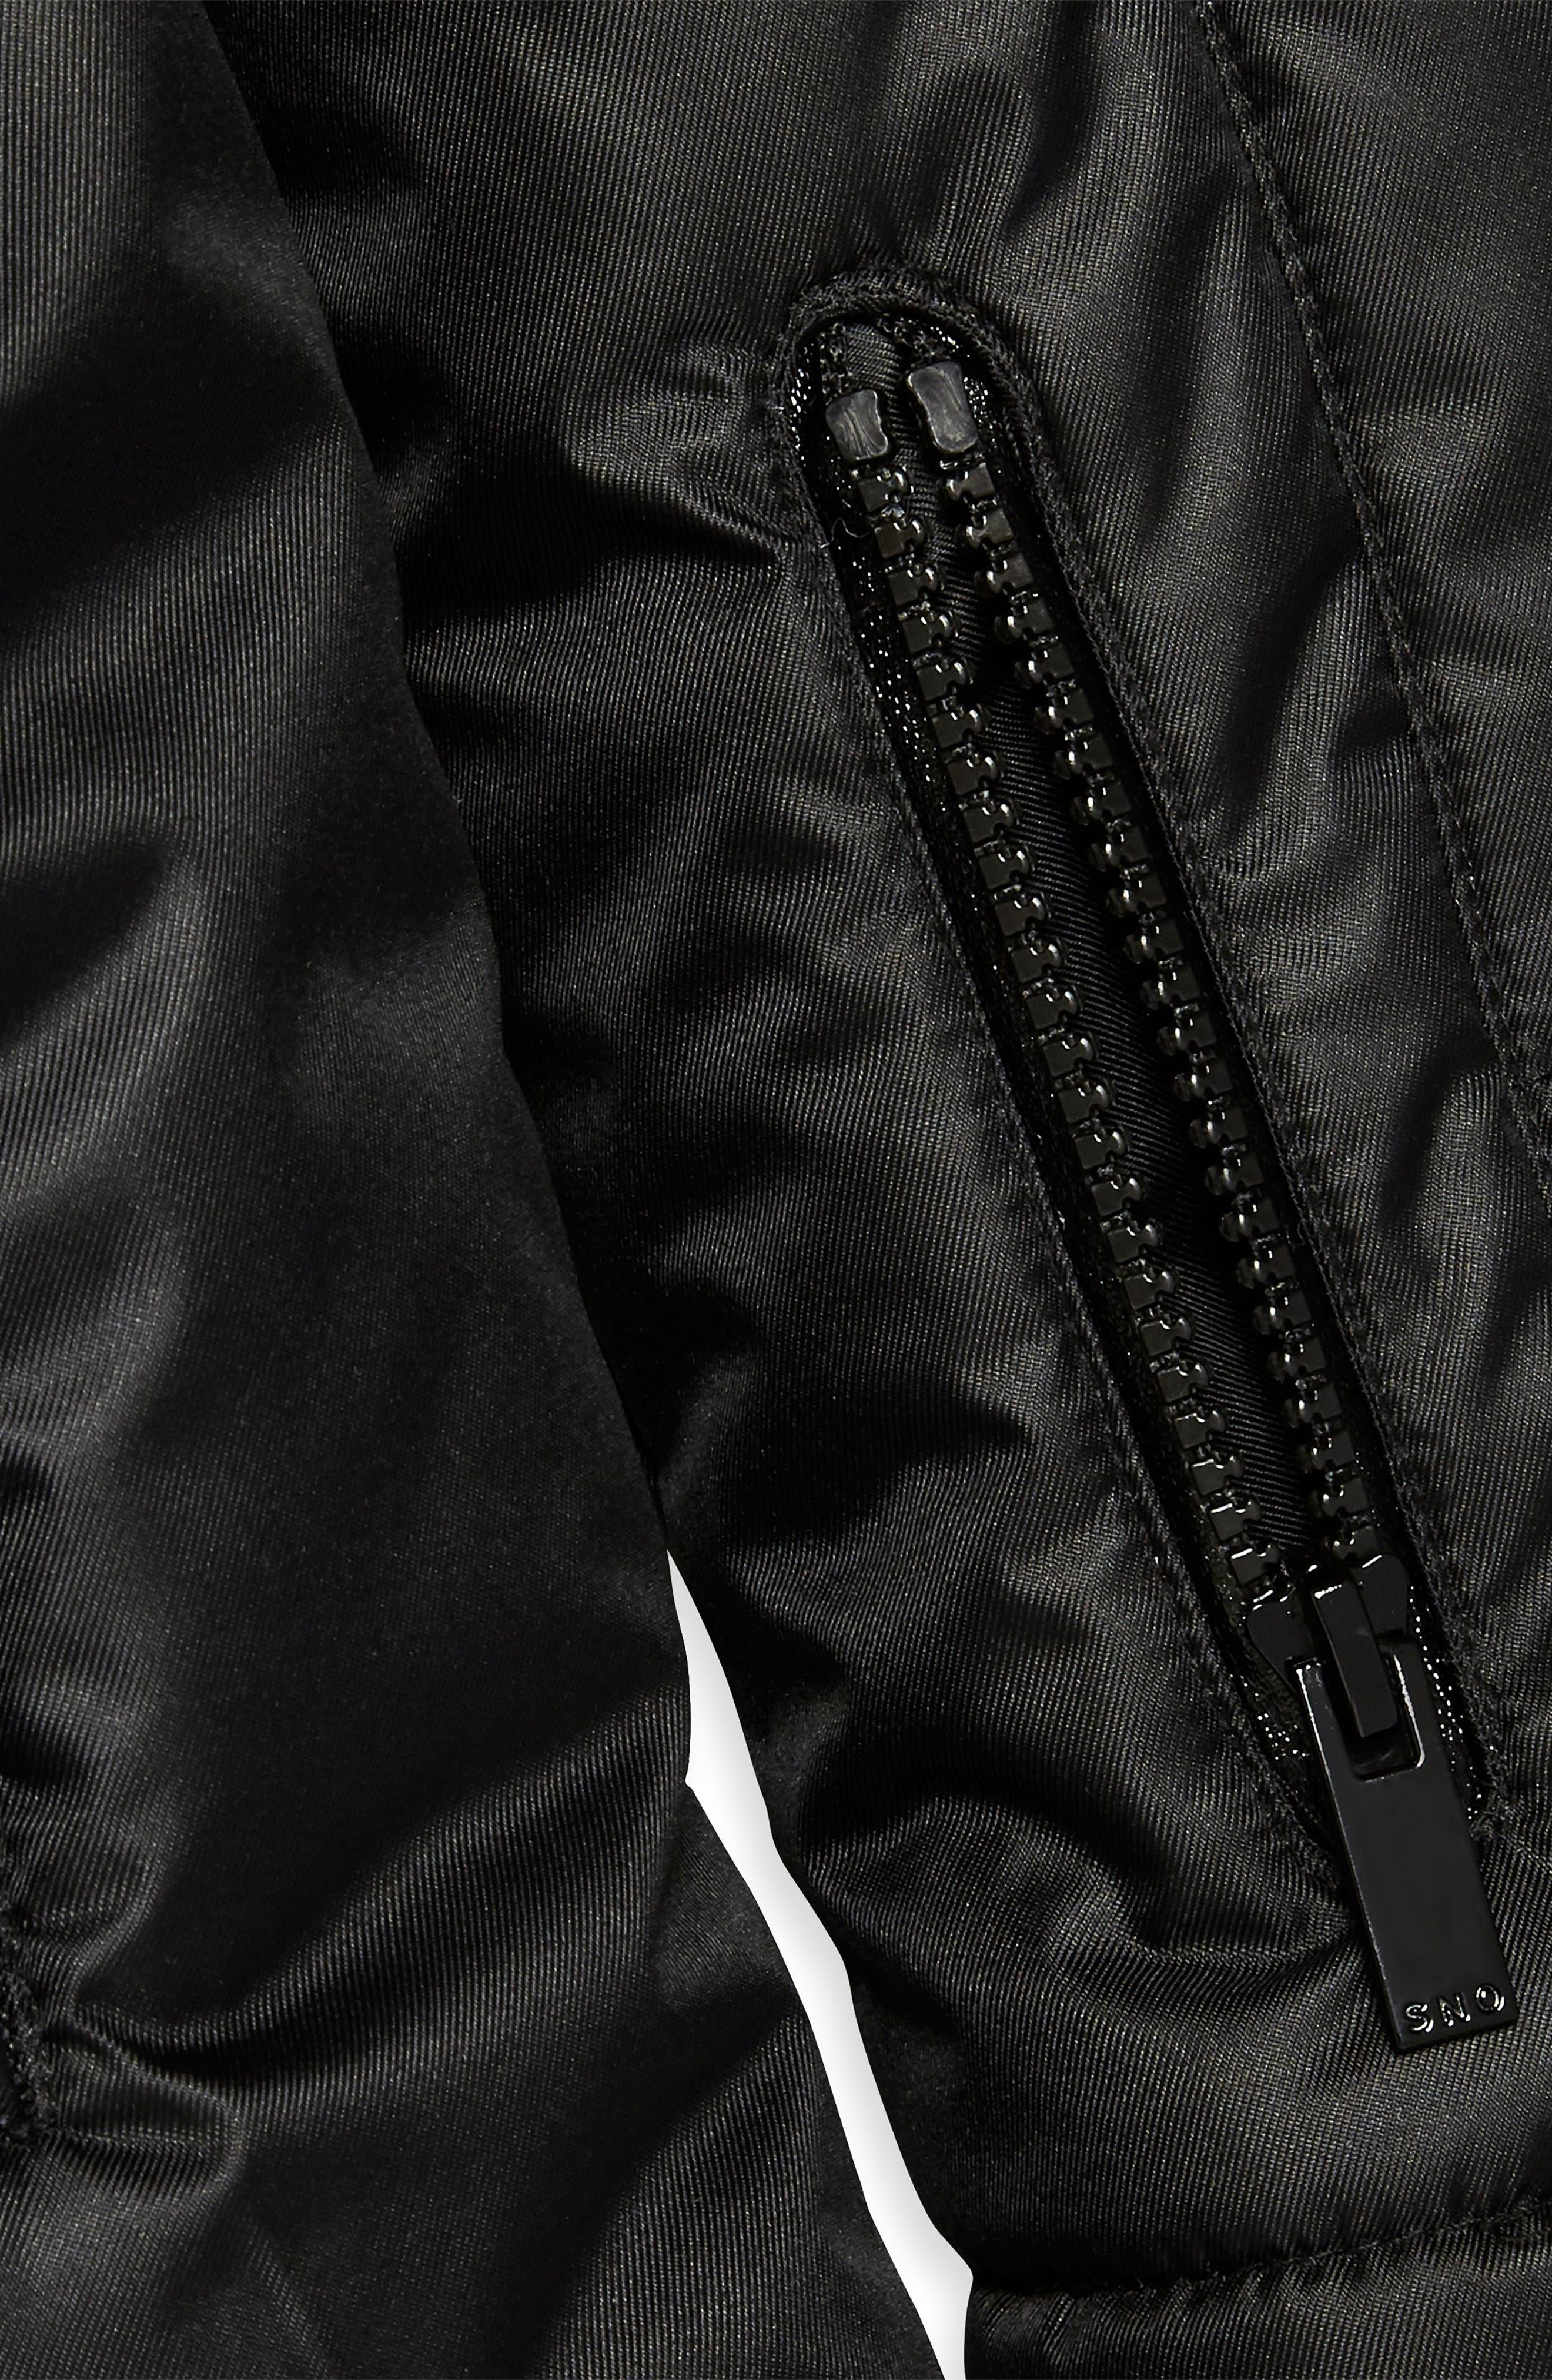 Sno Baby Ski Jacket,                             Alternate thumbnail 5, color,                             BLACK